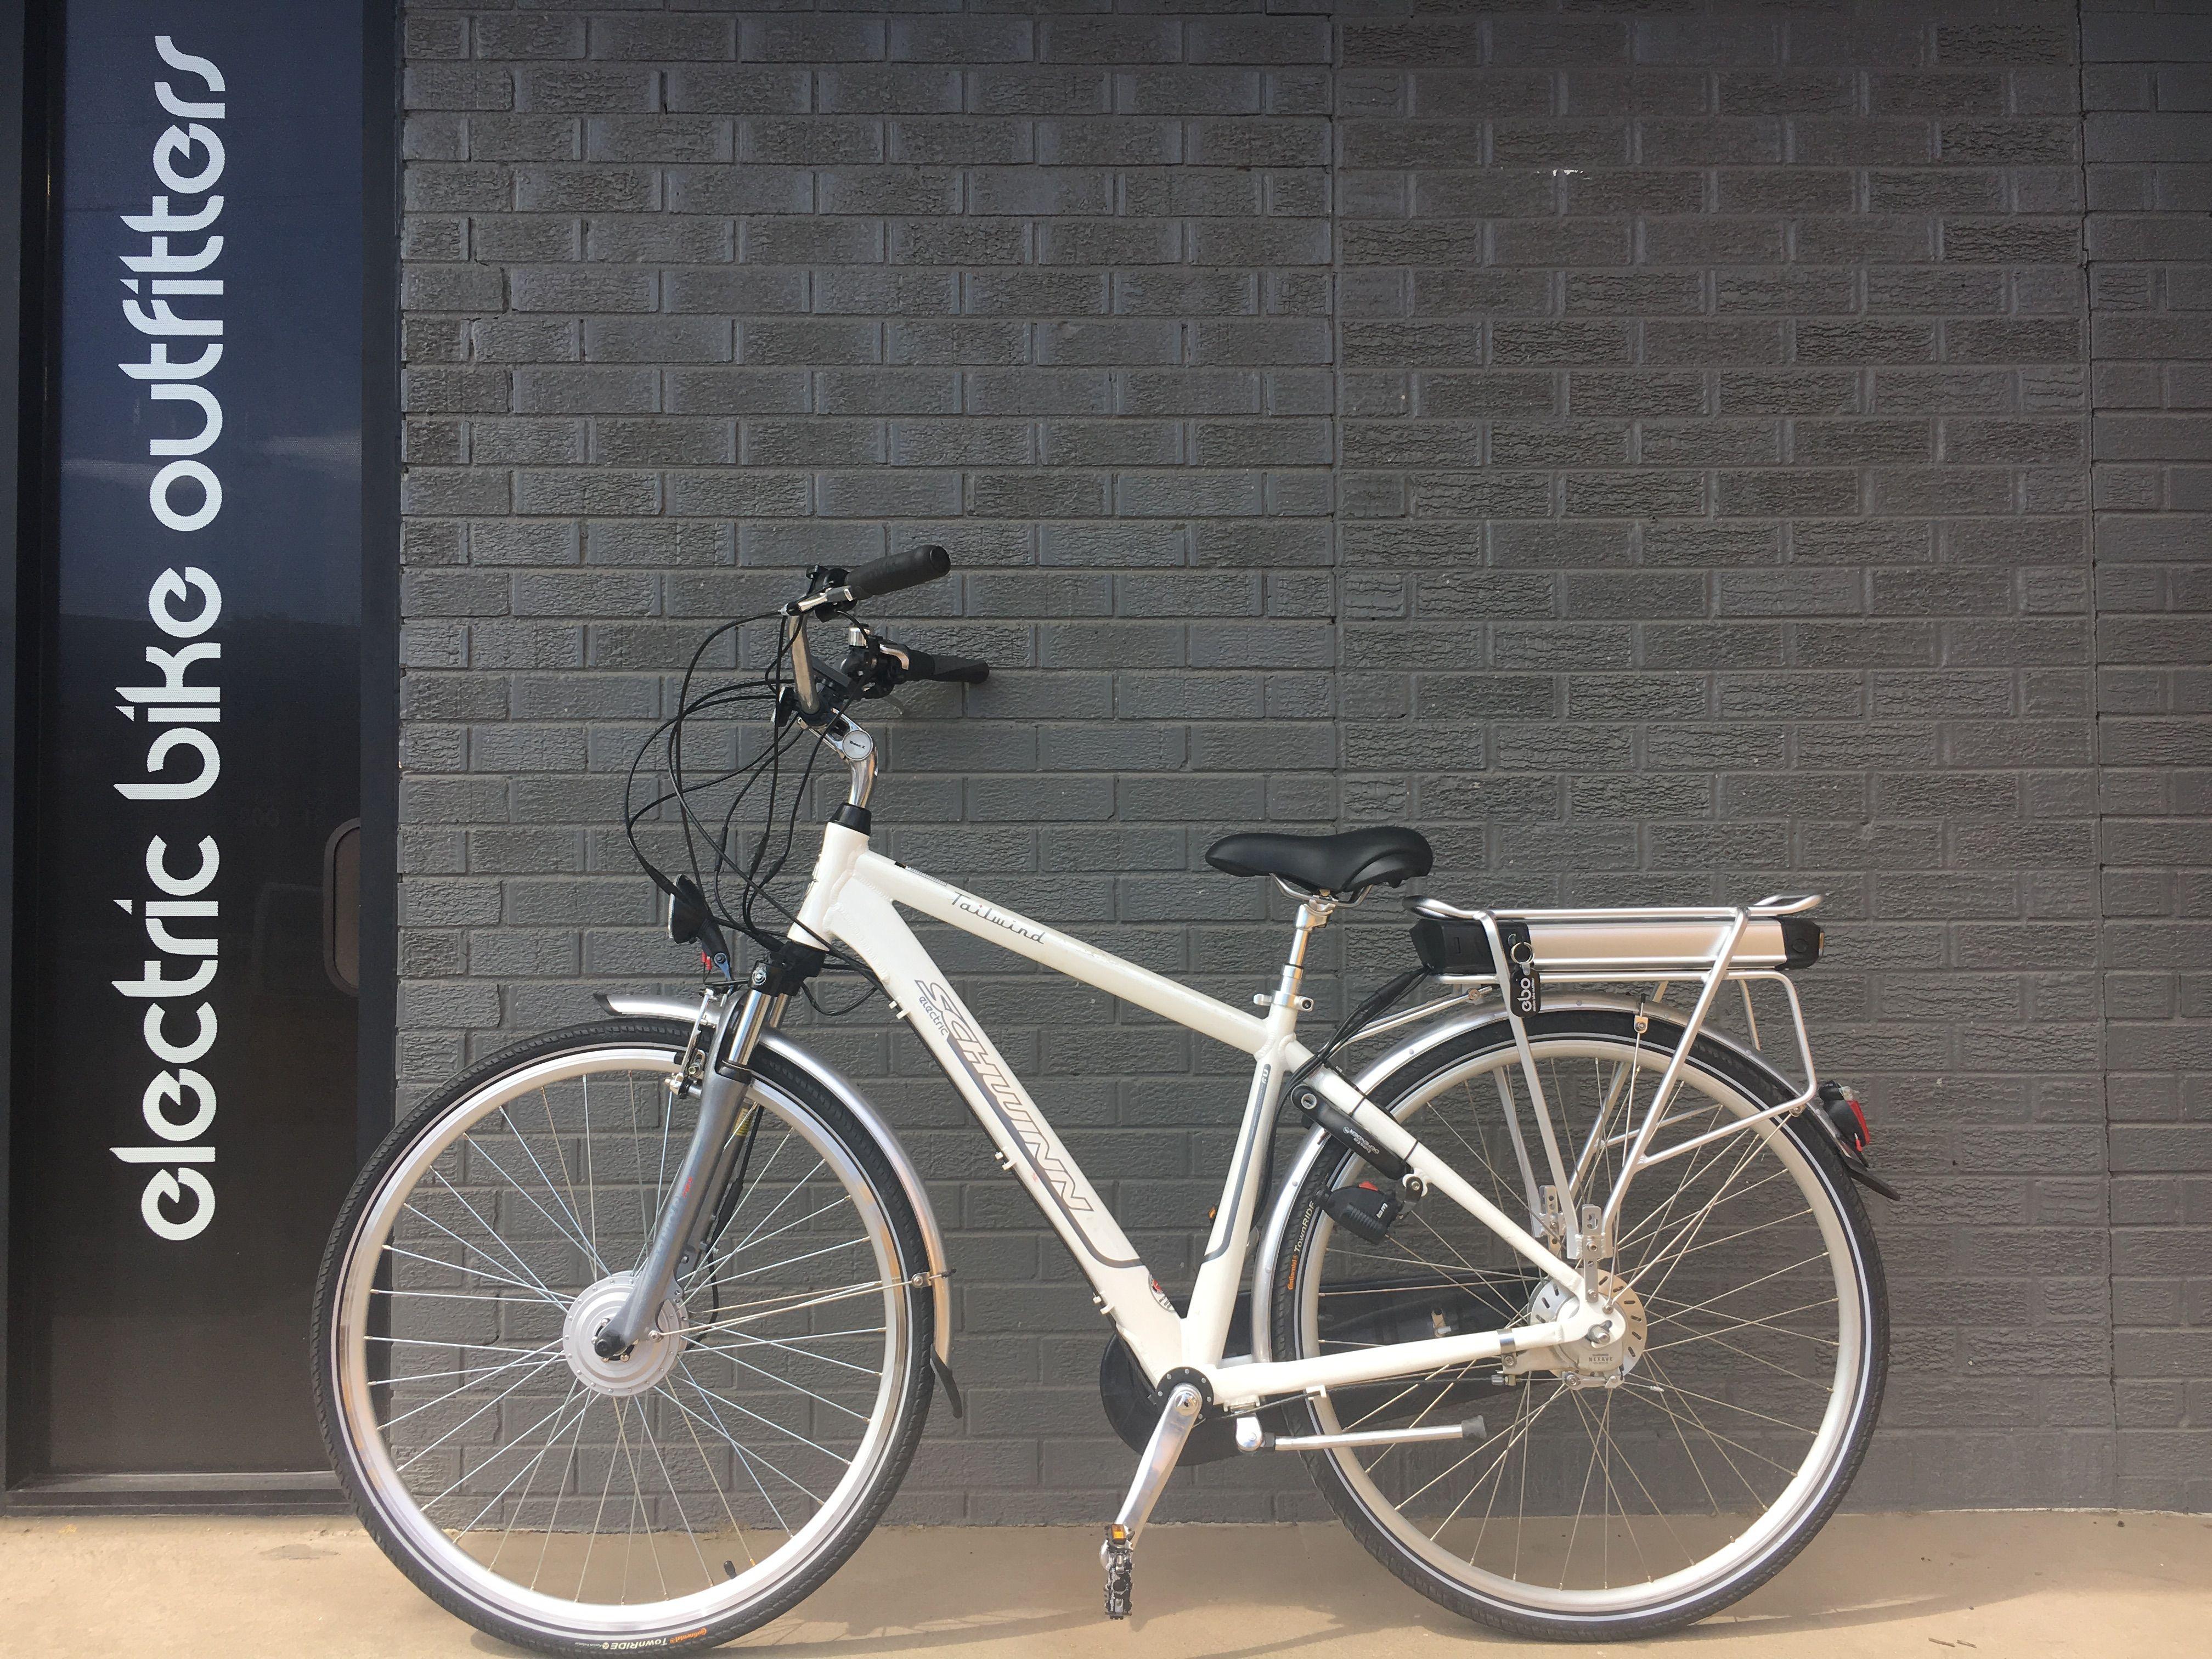 Ebo Cruiser Electric Bike Conversion Kit Installed On A Hp Gekko Fx For Adaptive Adventures Adaptive Adventure Electric Bike Conversion Electric Bike Catrike